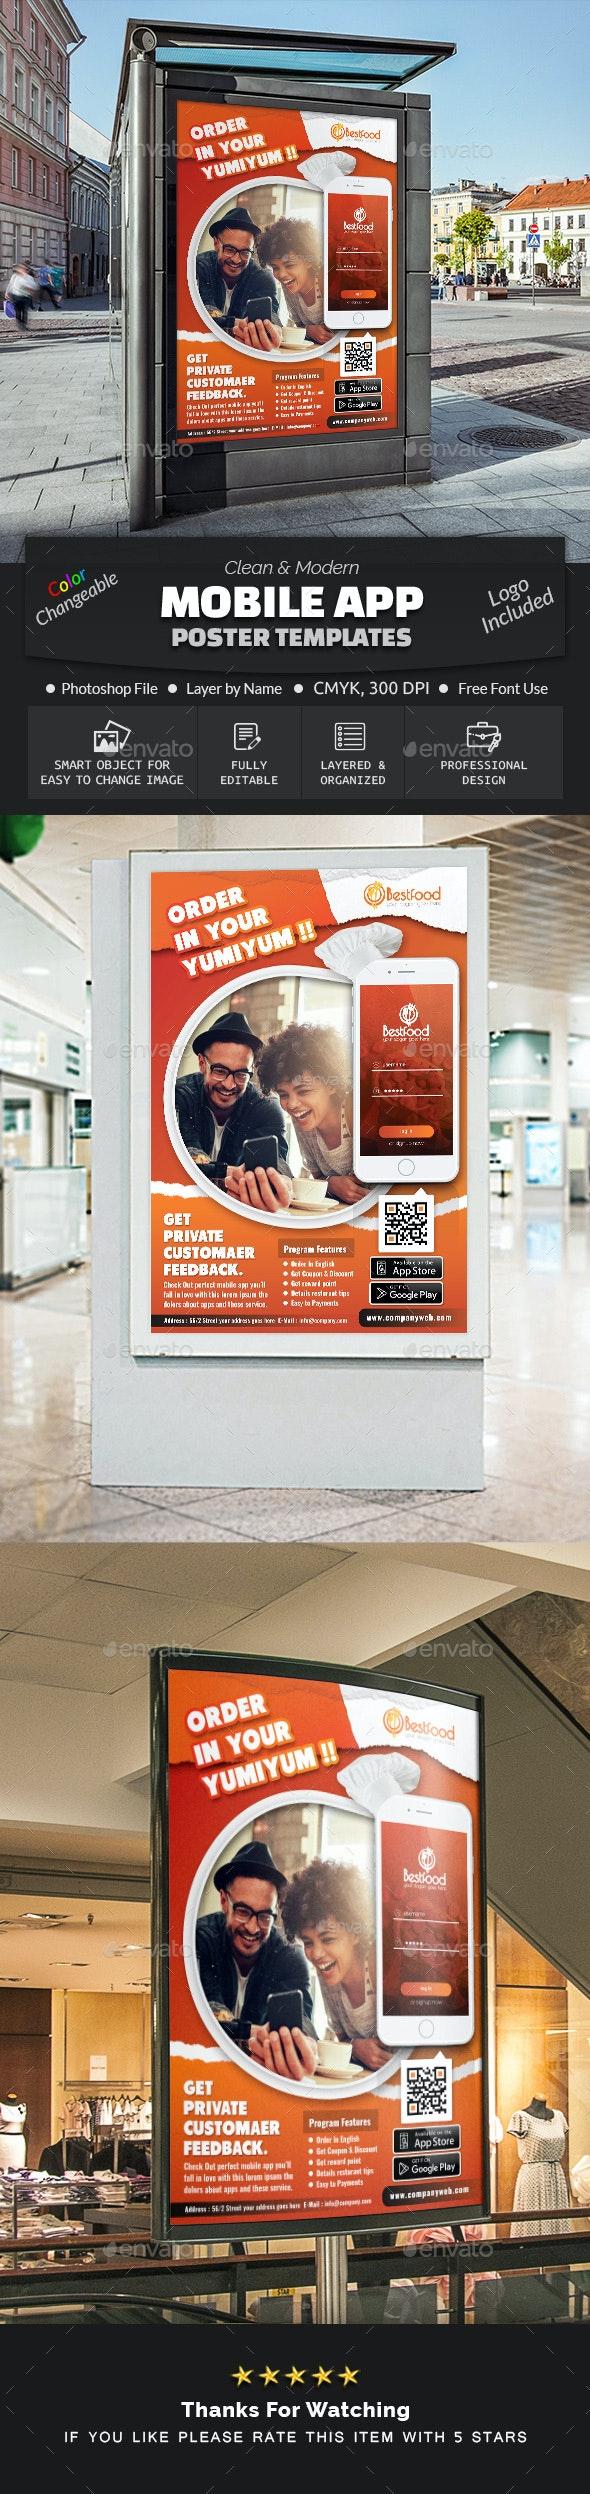 Restaurant Mobile App Poster Templates - Signage Print Templates